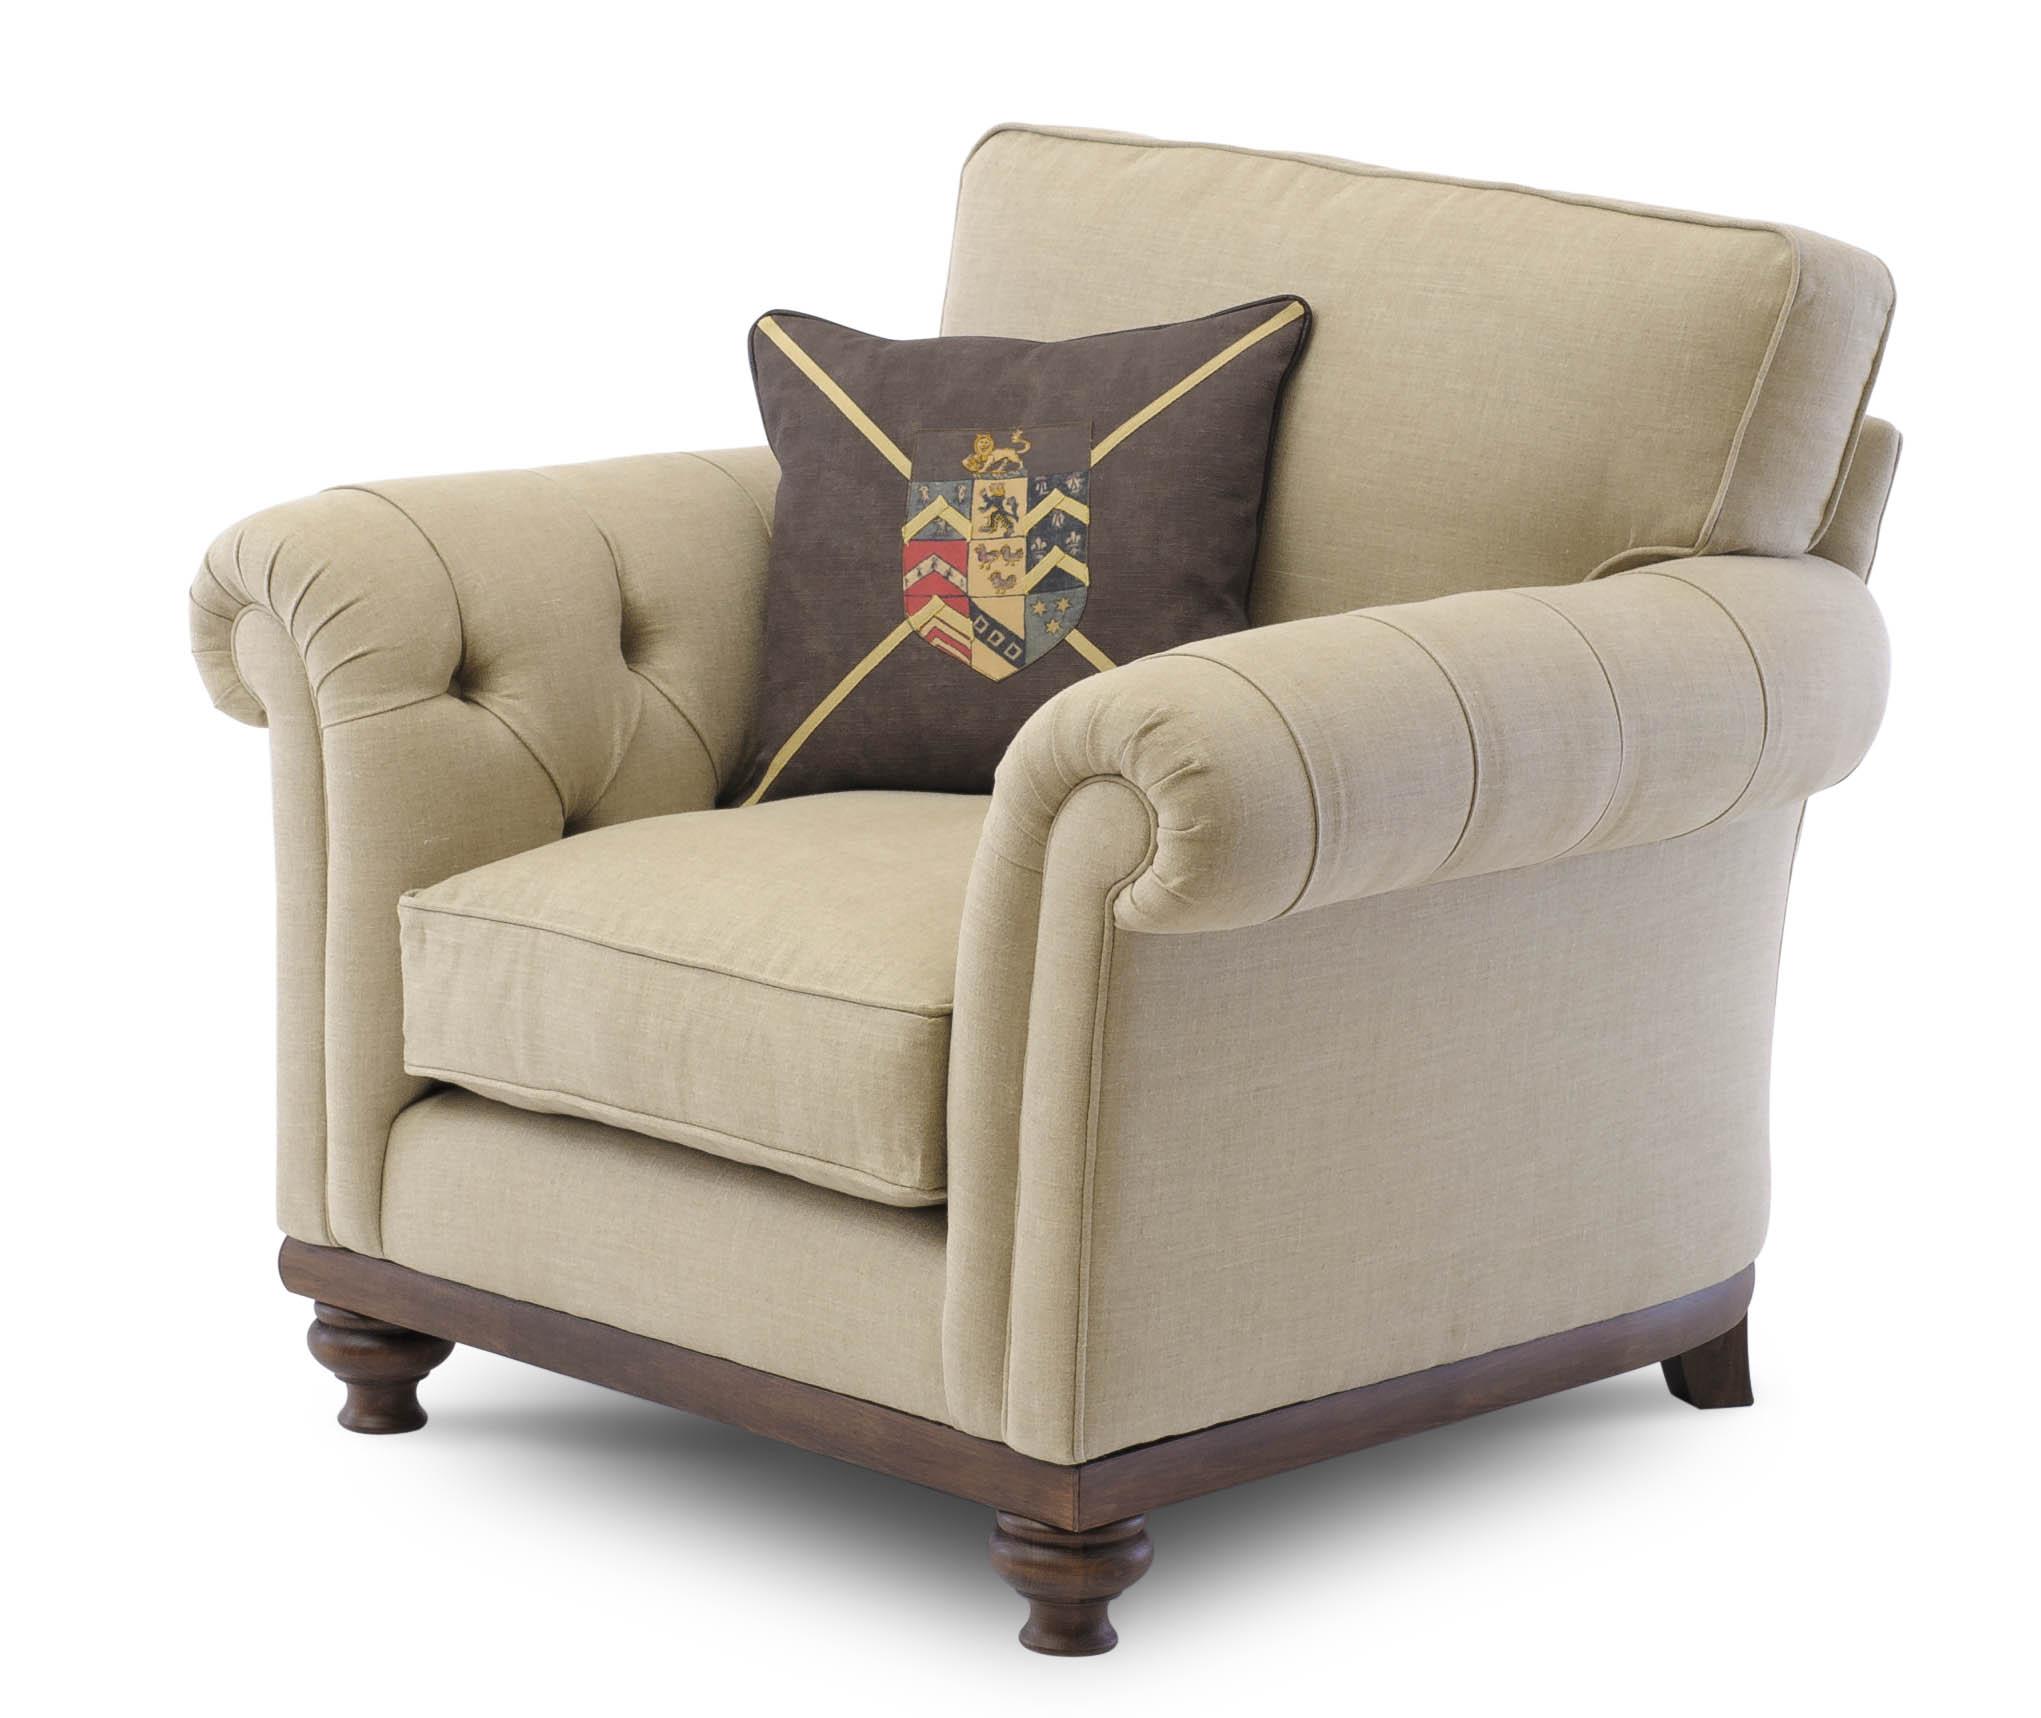 Cleeve 2st Sofa-153.jpg